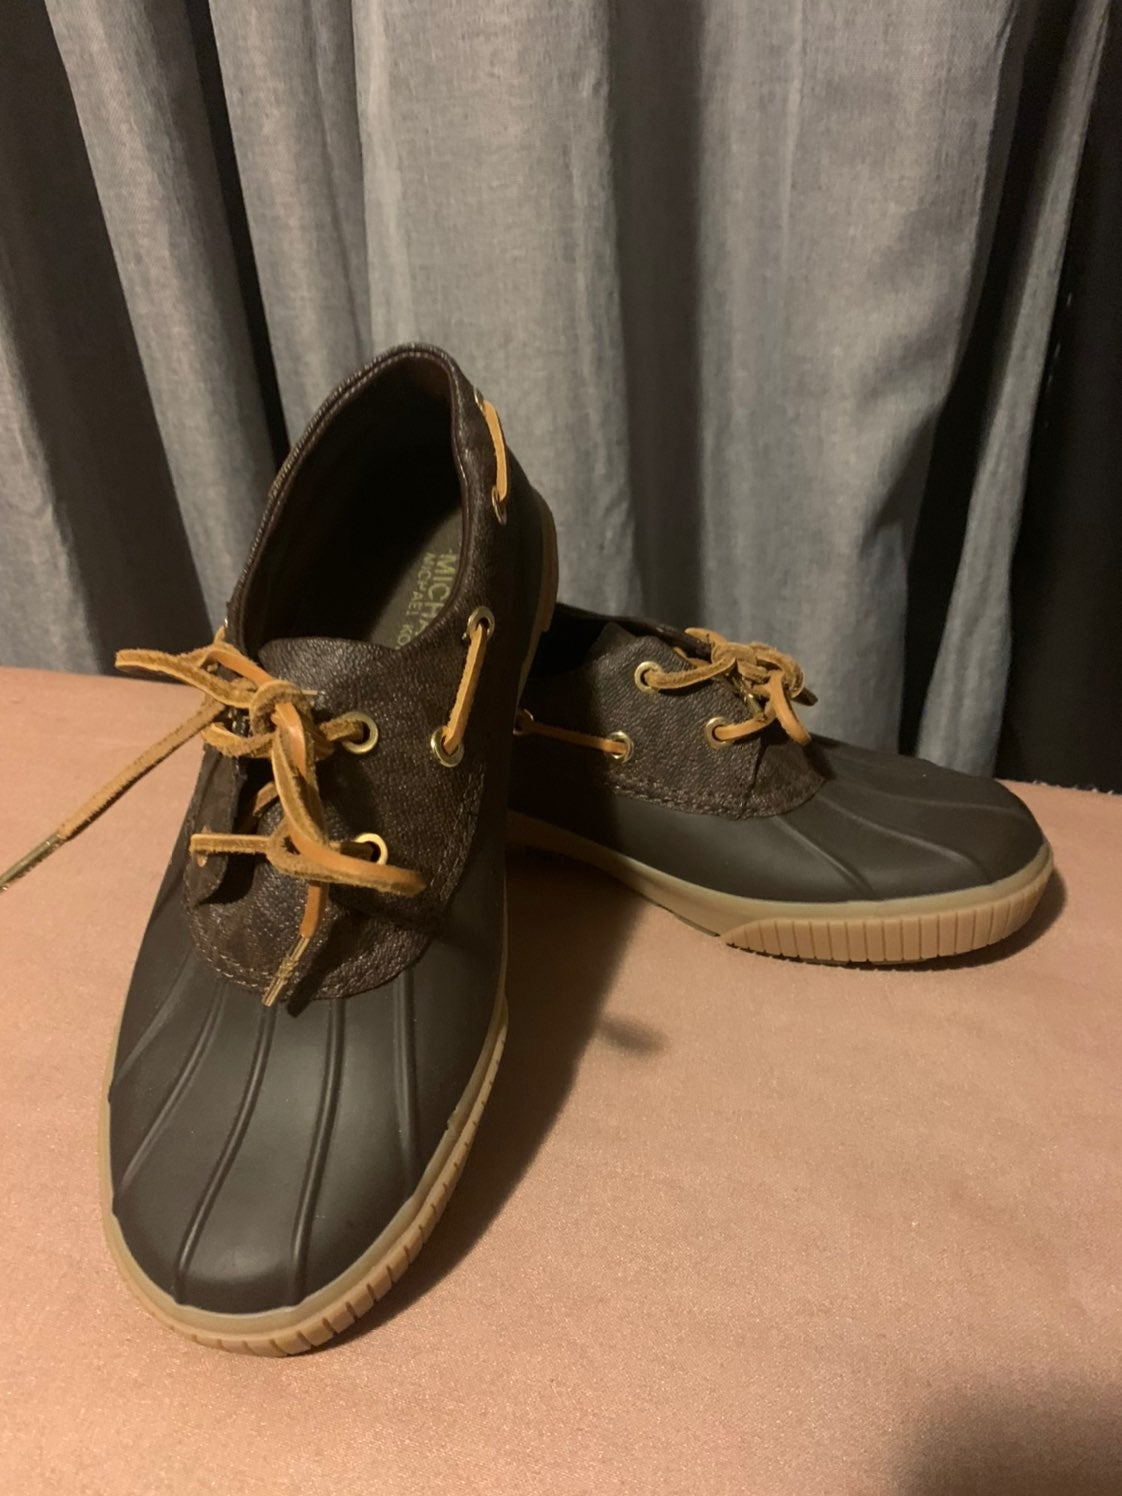 michael kors duck shoes size 6 5 women